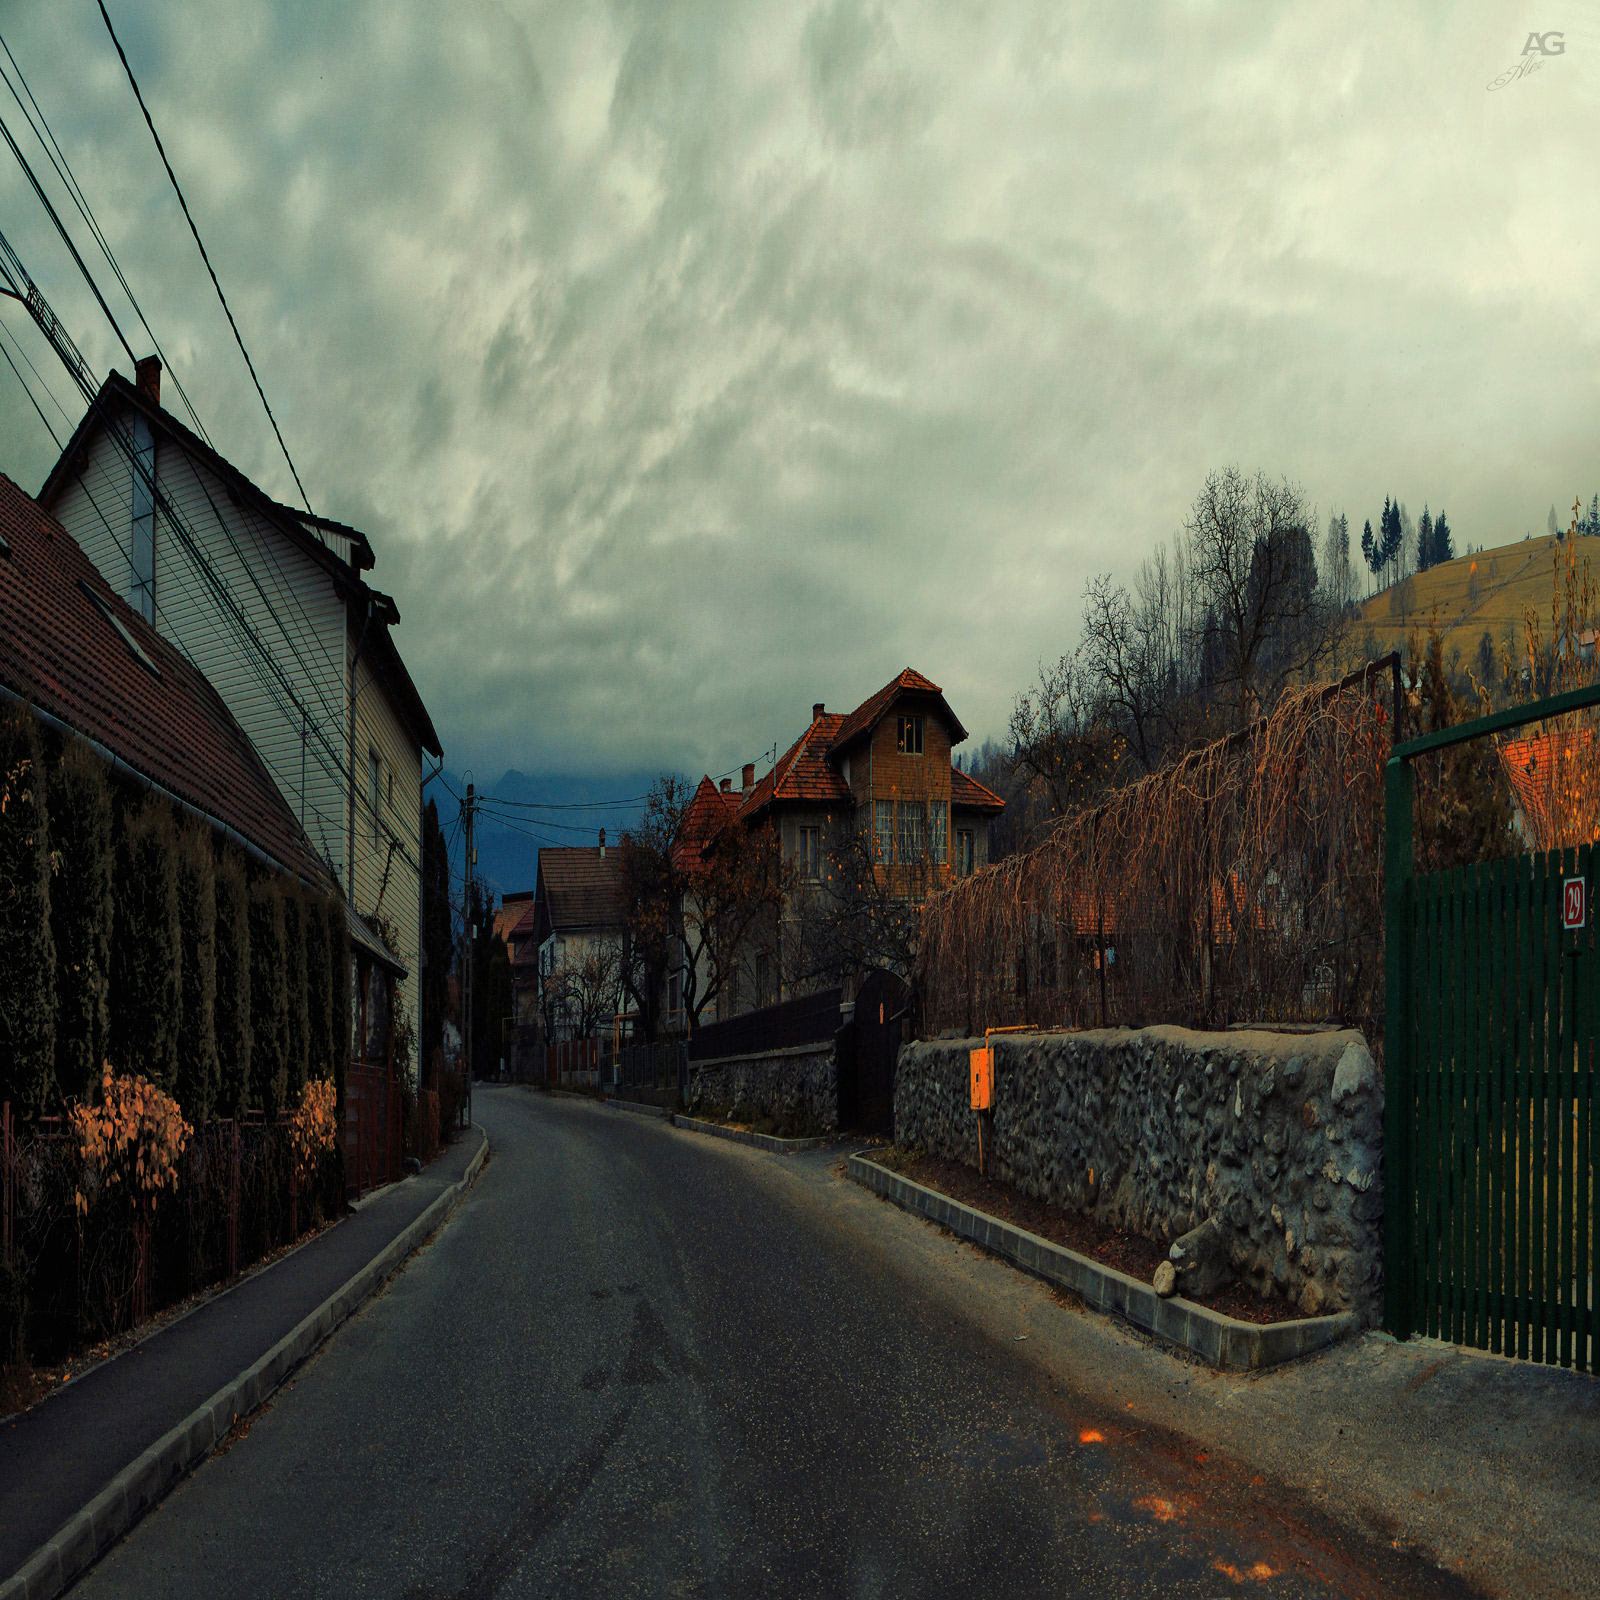 romania_bran_Street_squished_1600